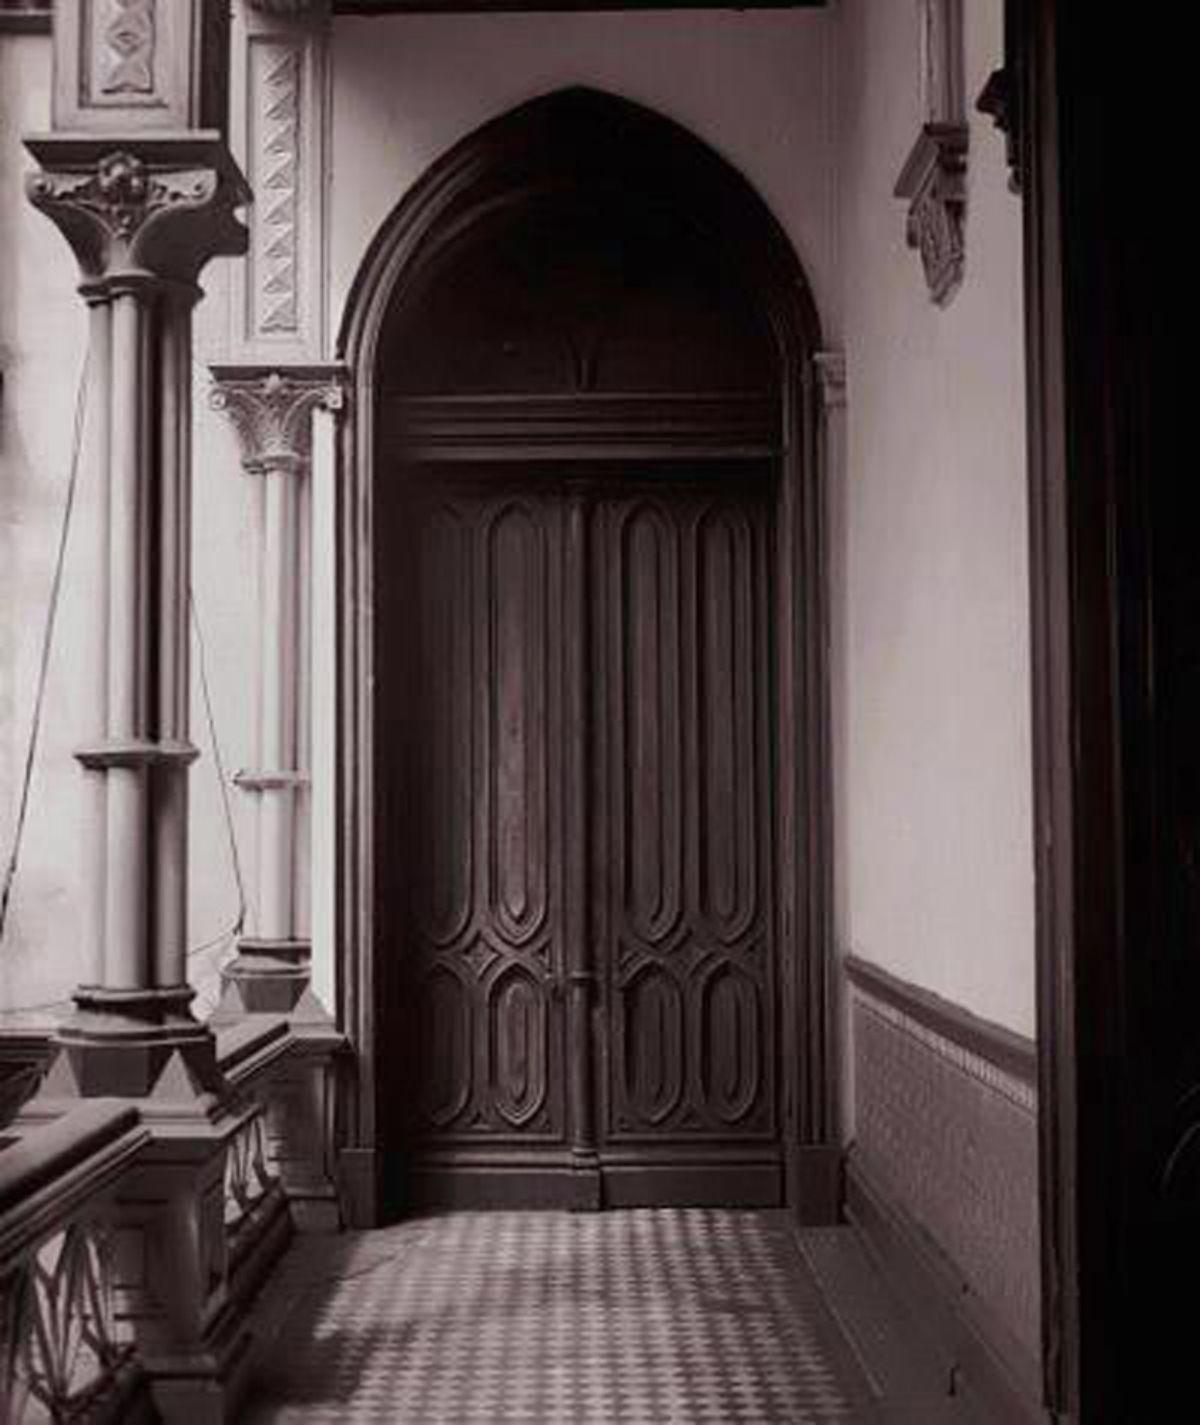 Old door  artwork by Juan Borja - art listed for sale on Artplode